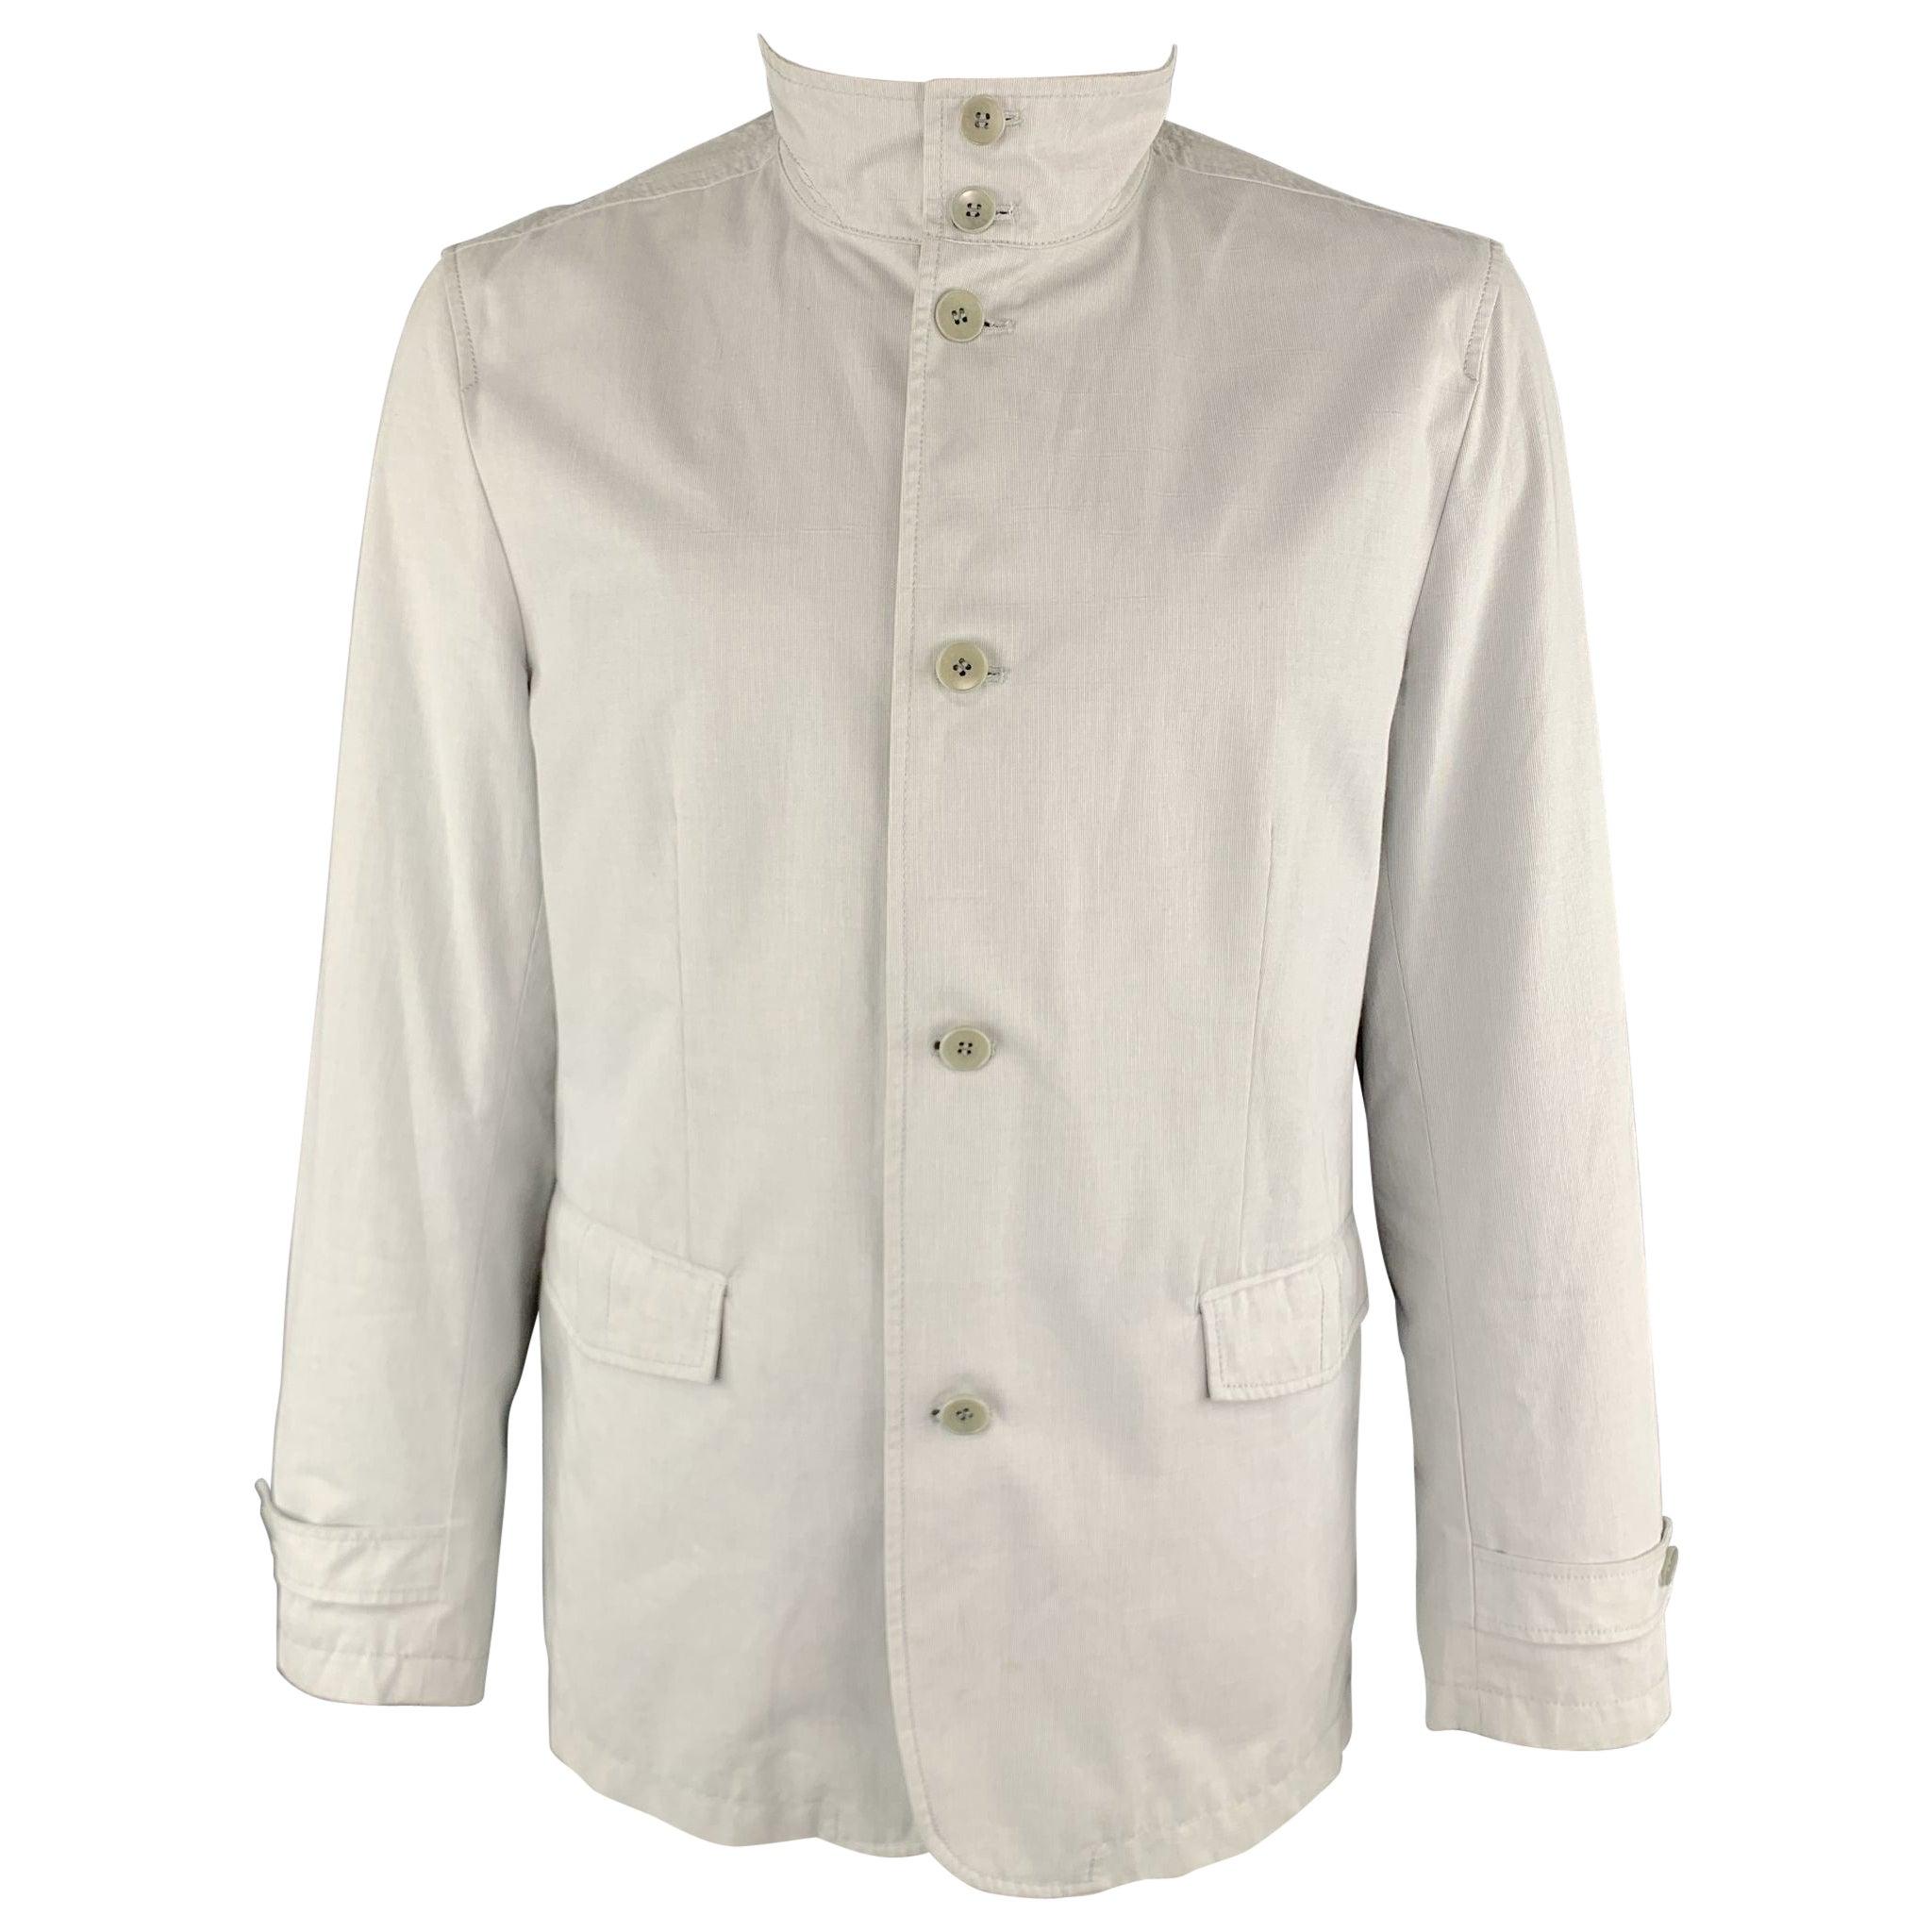 THEORY Jayden Size XL Light Grey Cotton High Collar Belted Cuffs Buttoned Jacket